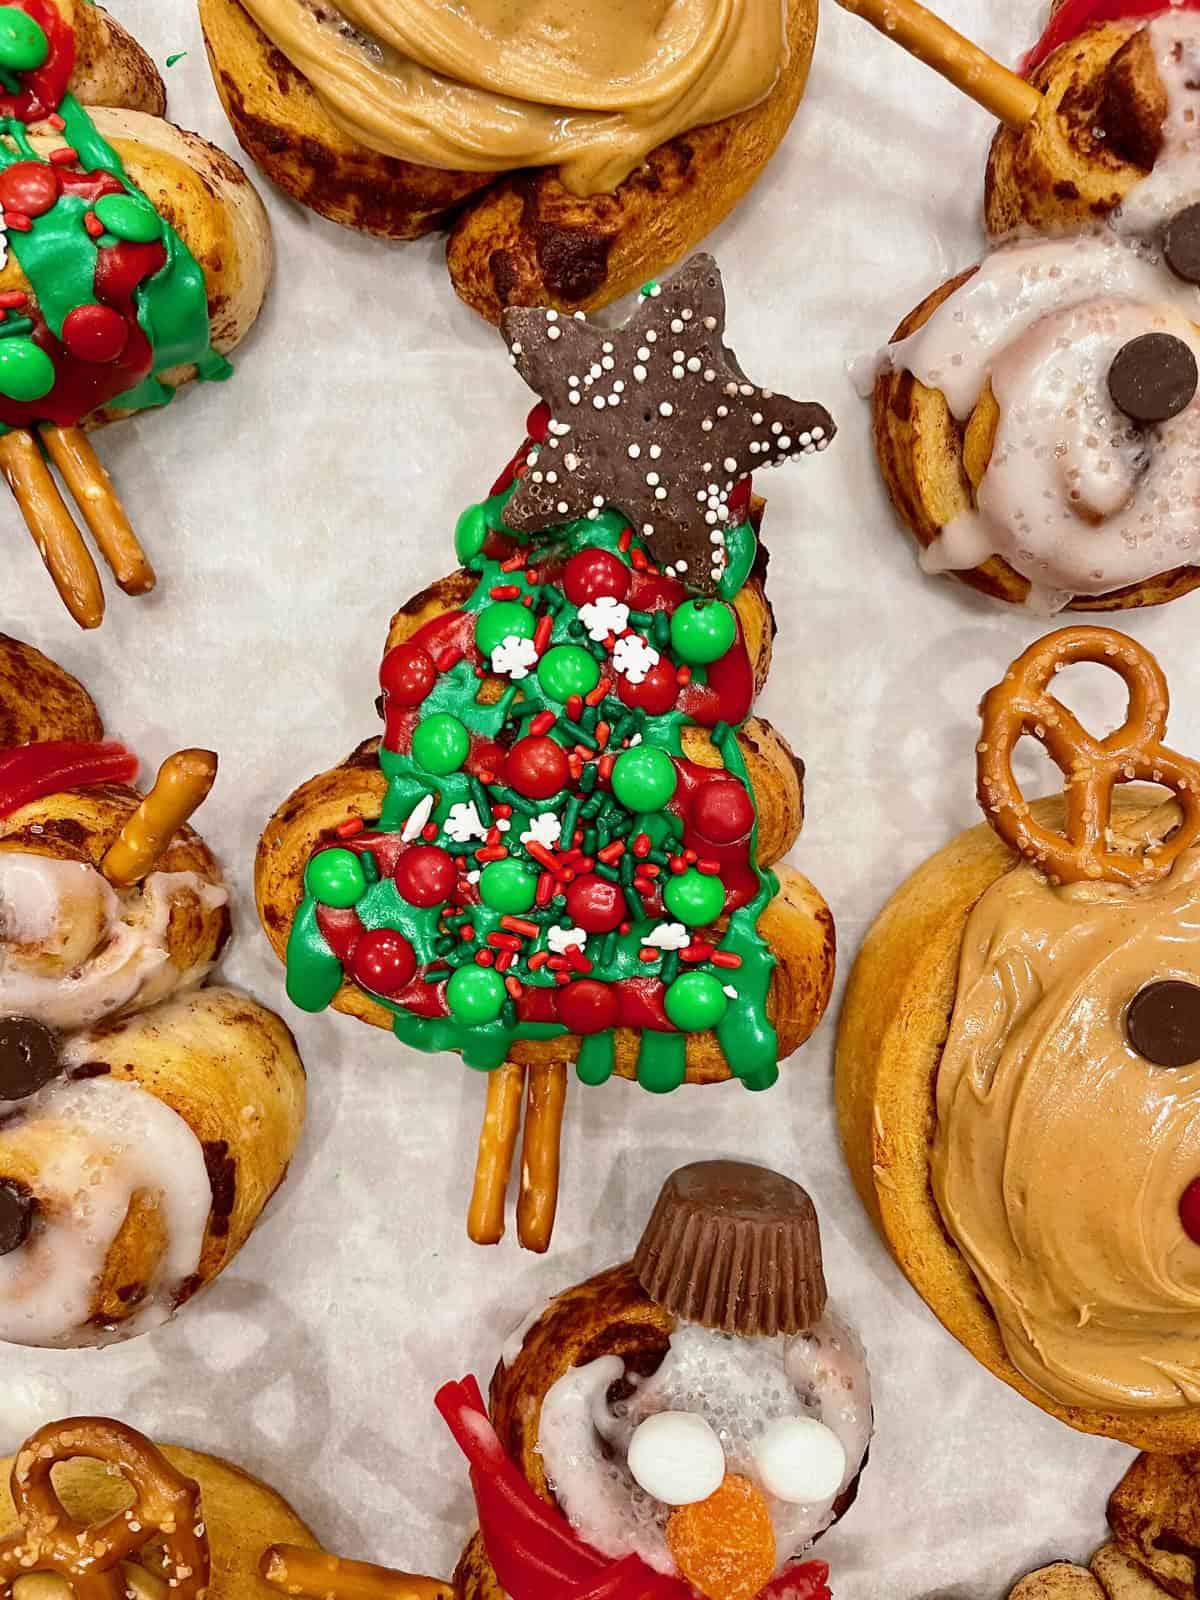 Festive Christmas-Shaped Cinnamon Rolls